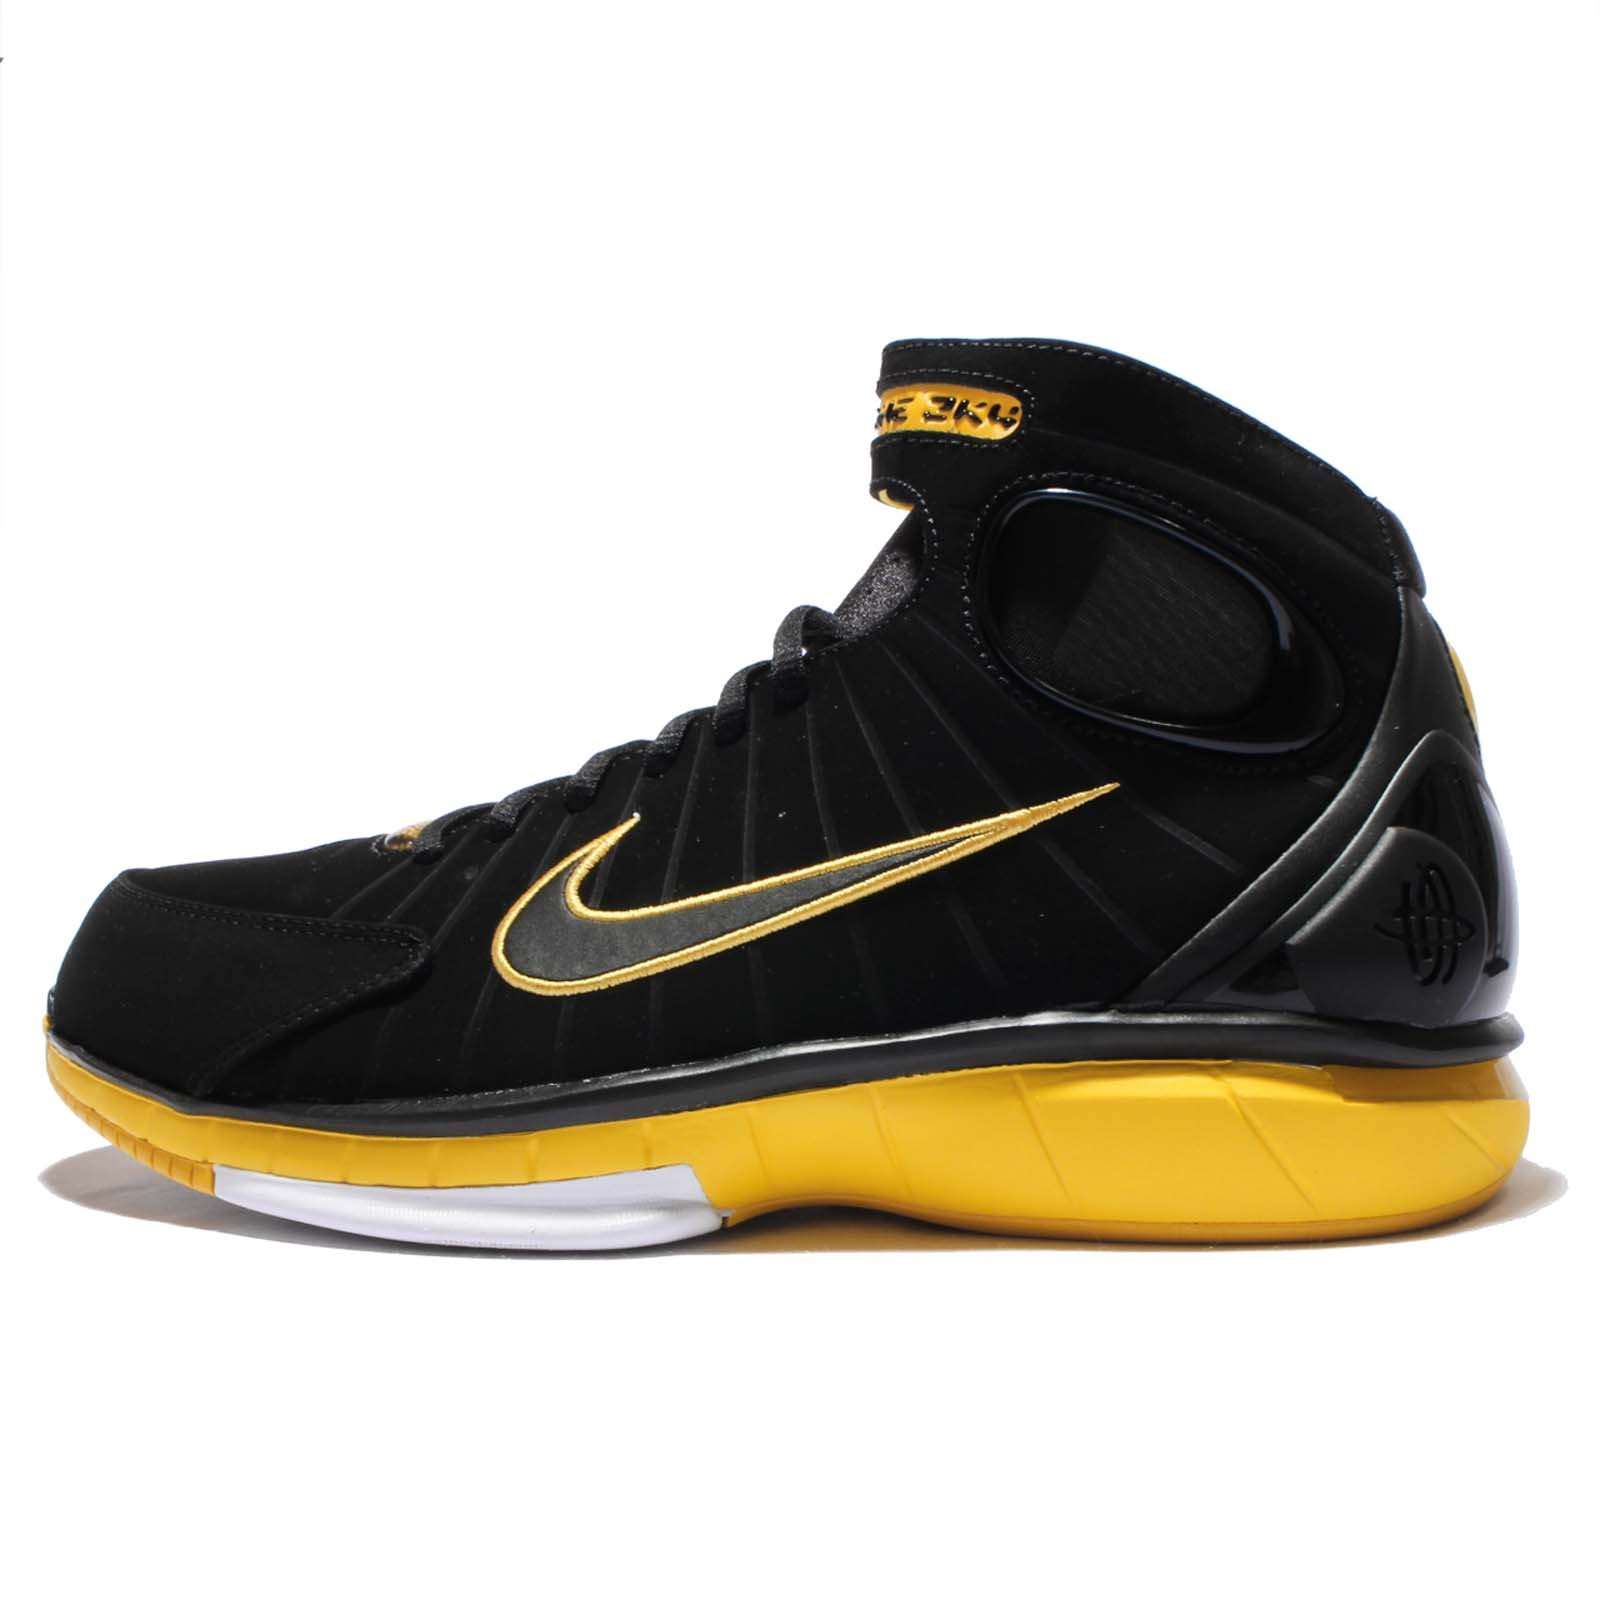 Nike Men's Air Zoom Huarache 2K4 (9.5 D(M) US, BlackBlack Varsity Maize White)